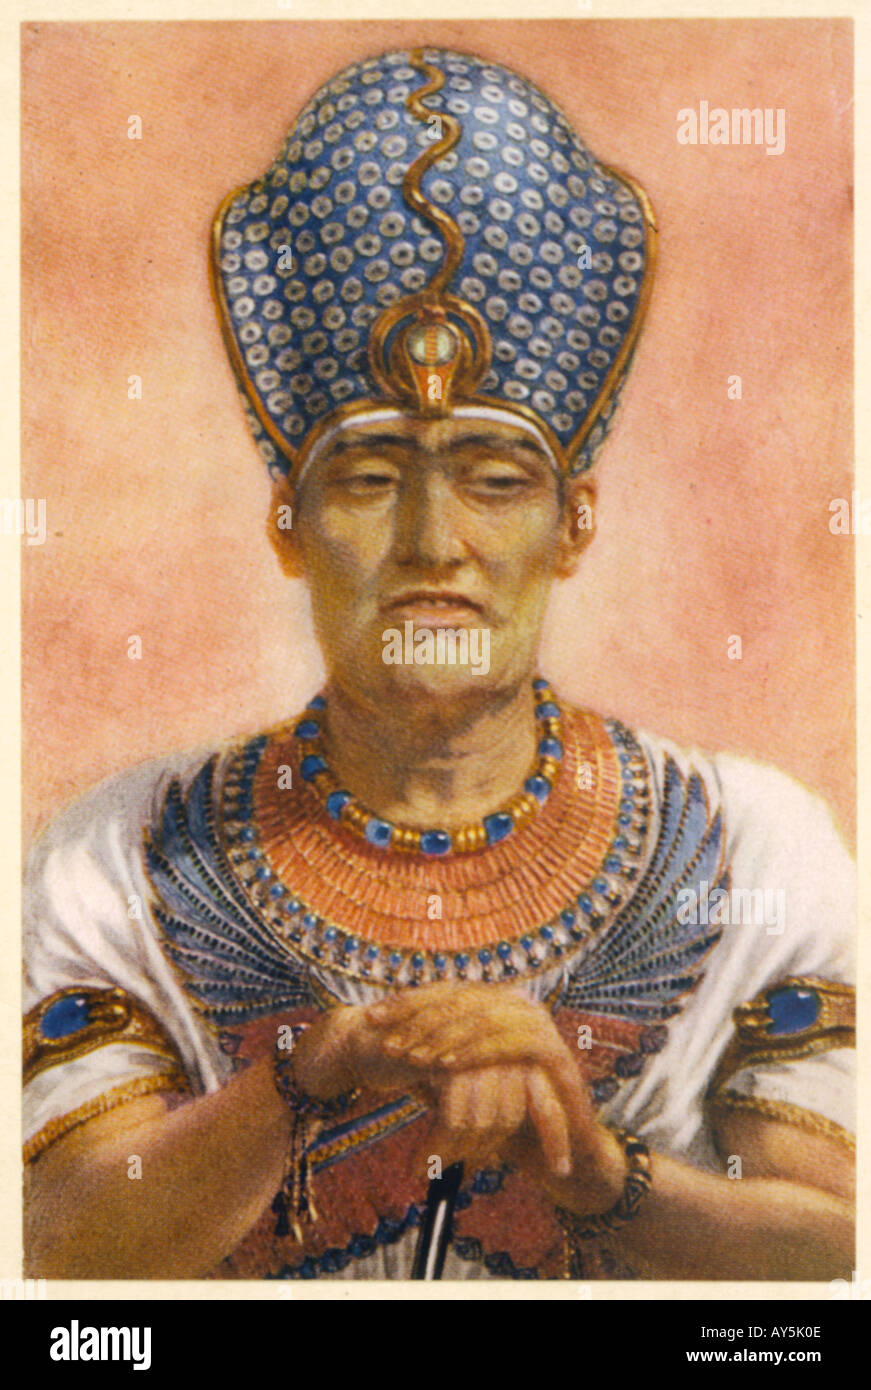 pharaoh stock photos amp pharaoh stock images alamy